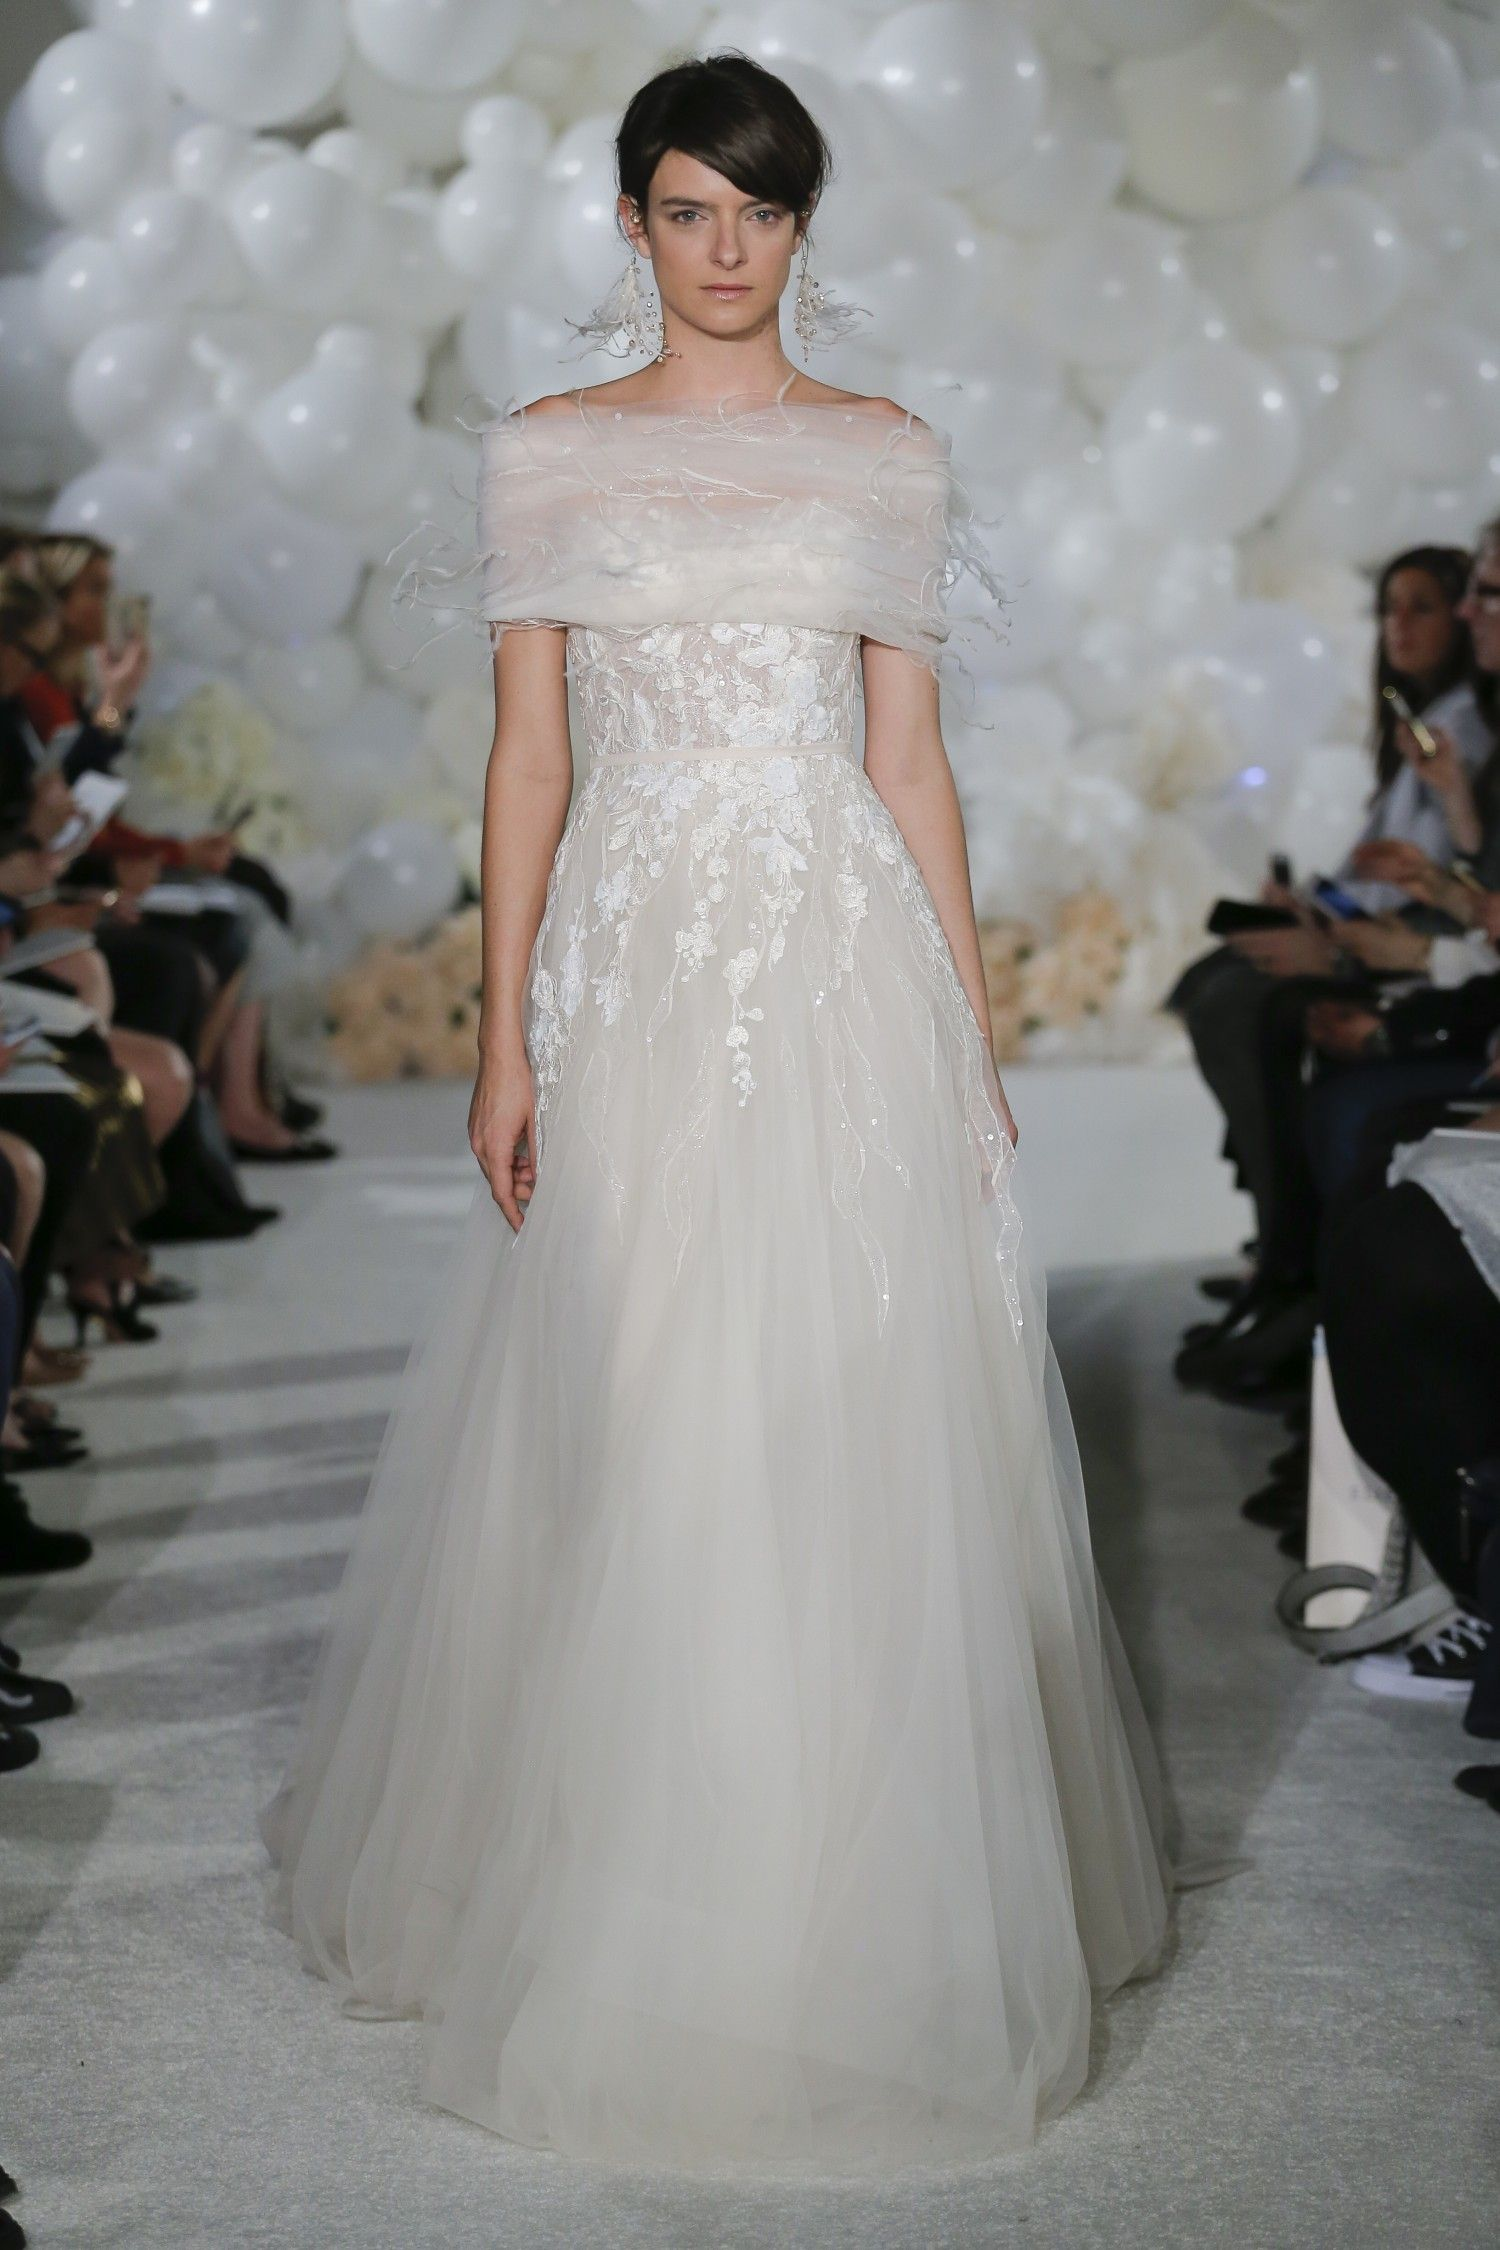 conservative wedding dress, modest, bridal trend, covered up